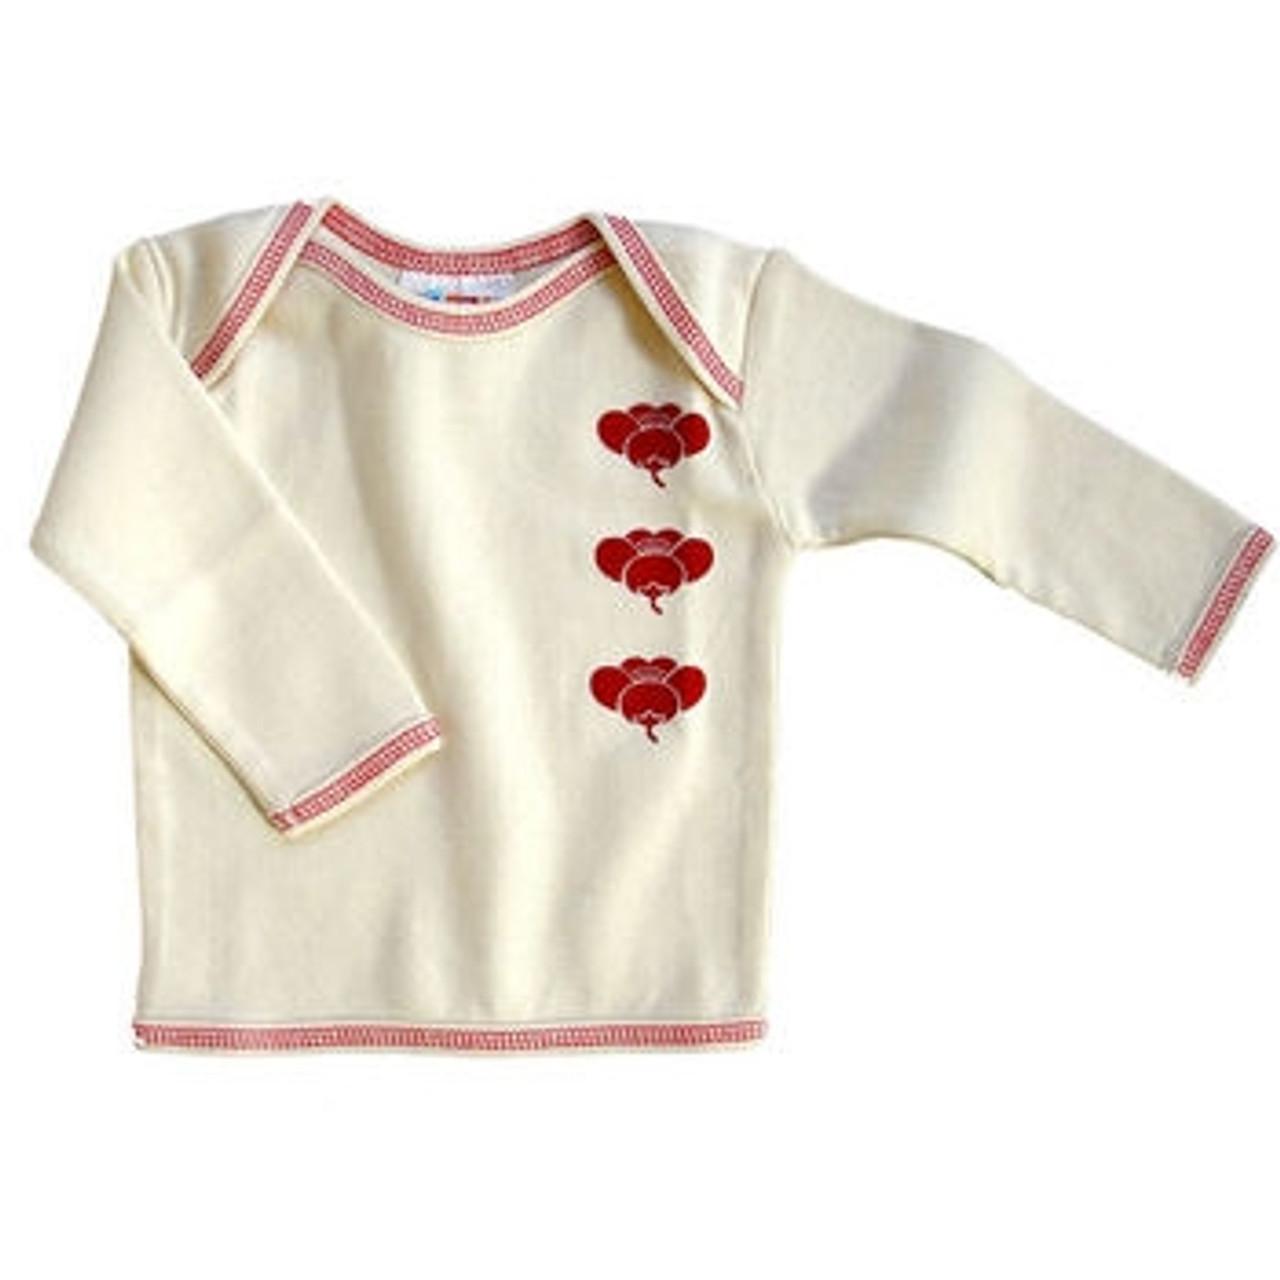 Organic Baby Clothes - Plum Tee